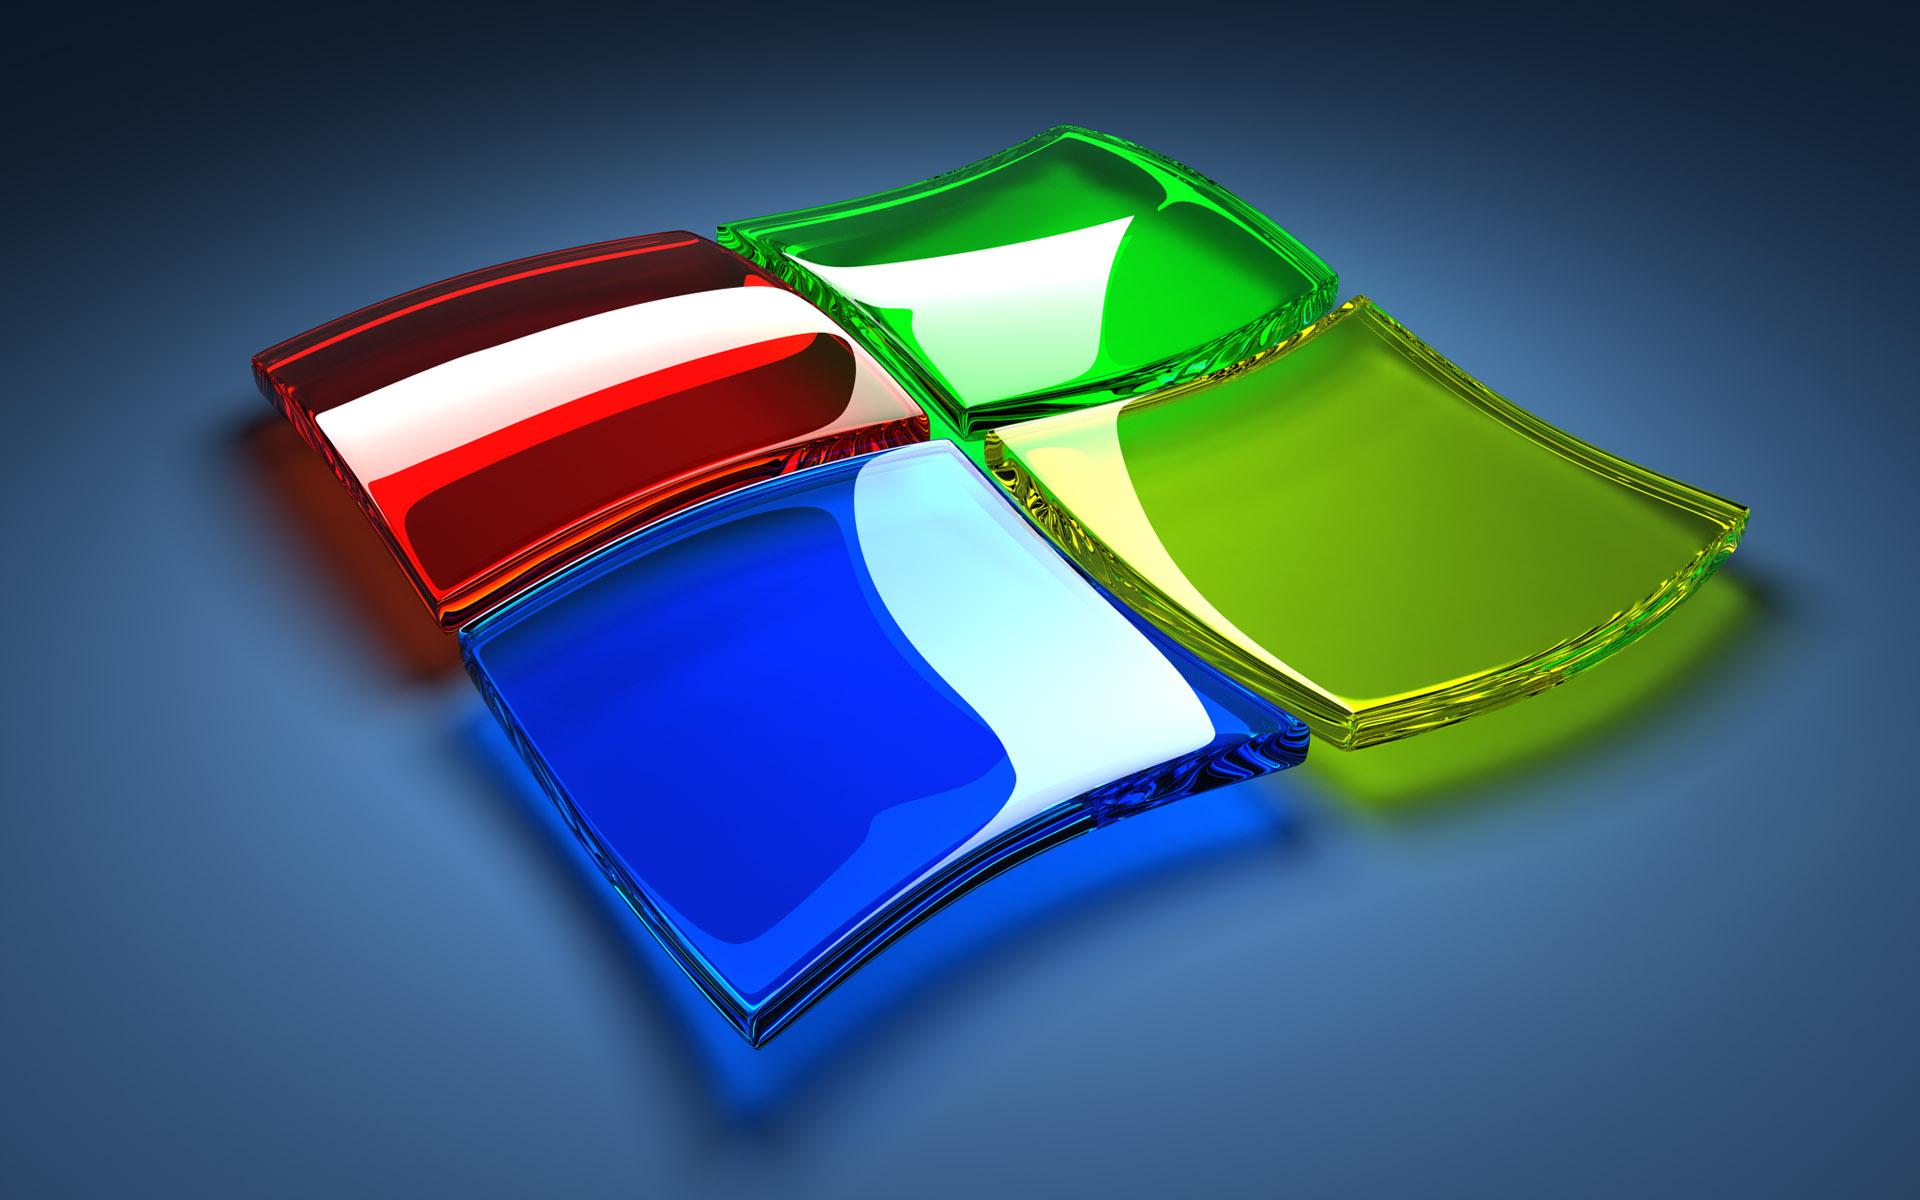 windows 8 wallpaper hd 12 Download Windows 8 Wallpapers HD 1920x1200